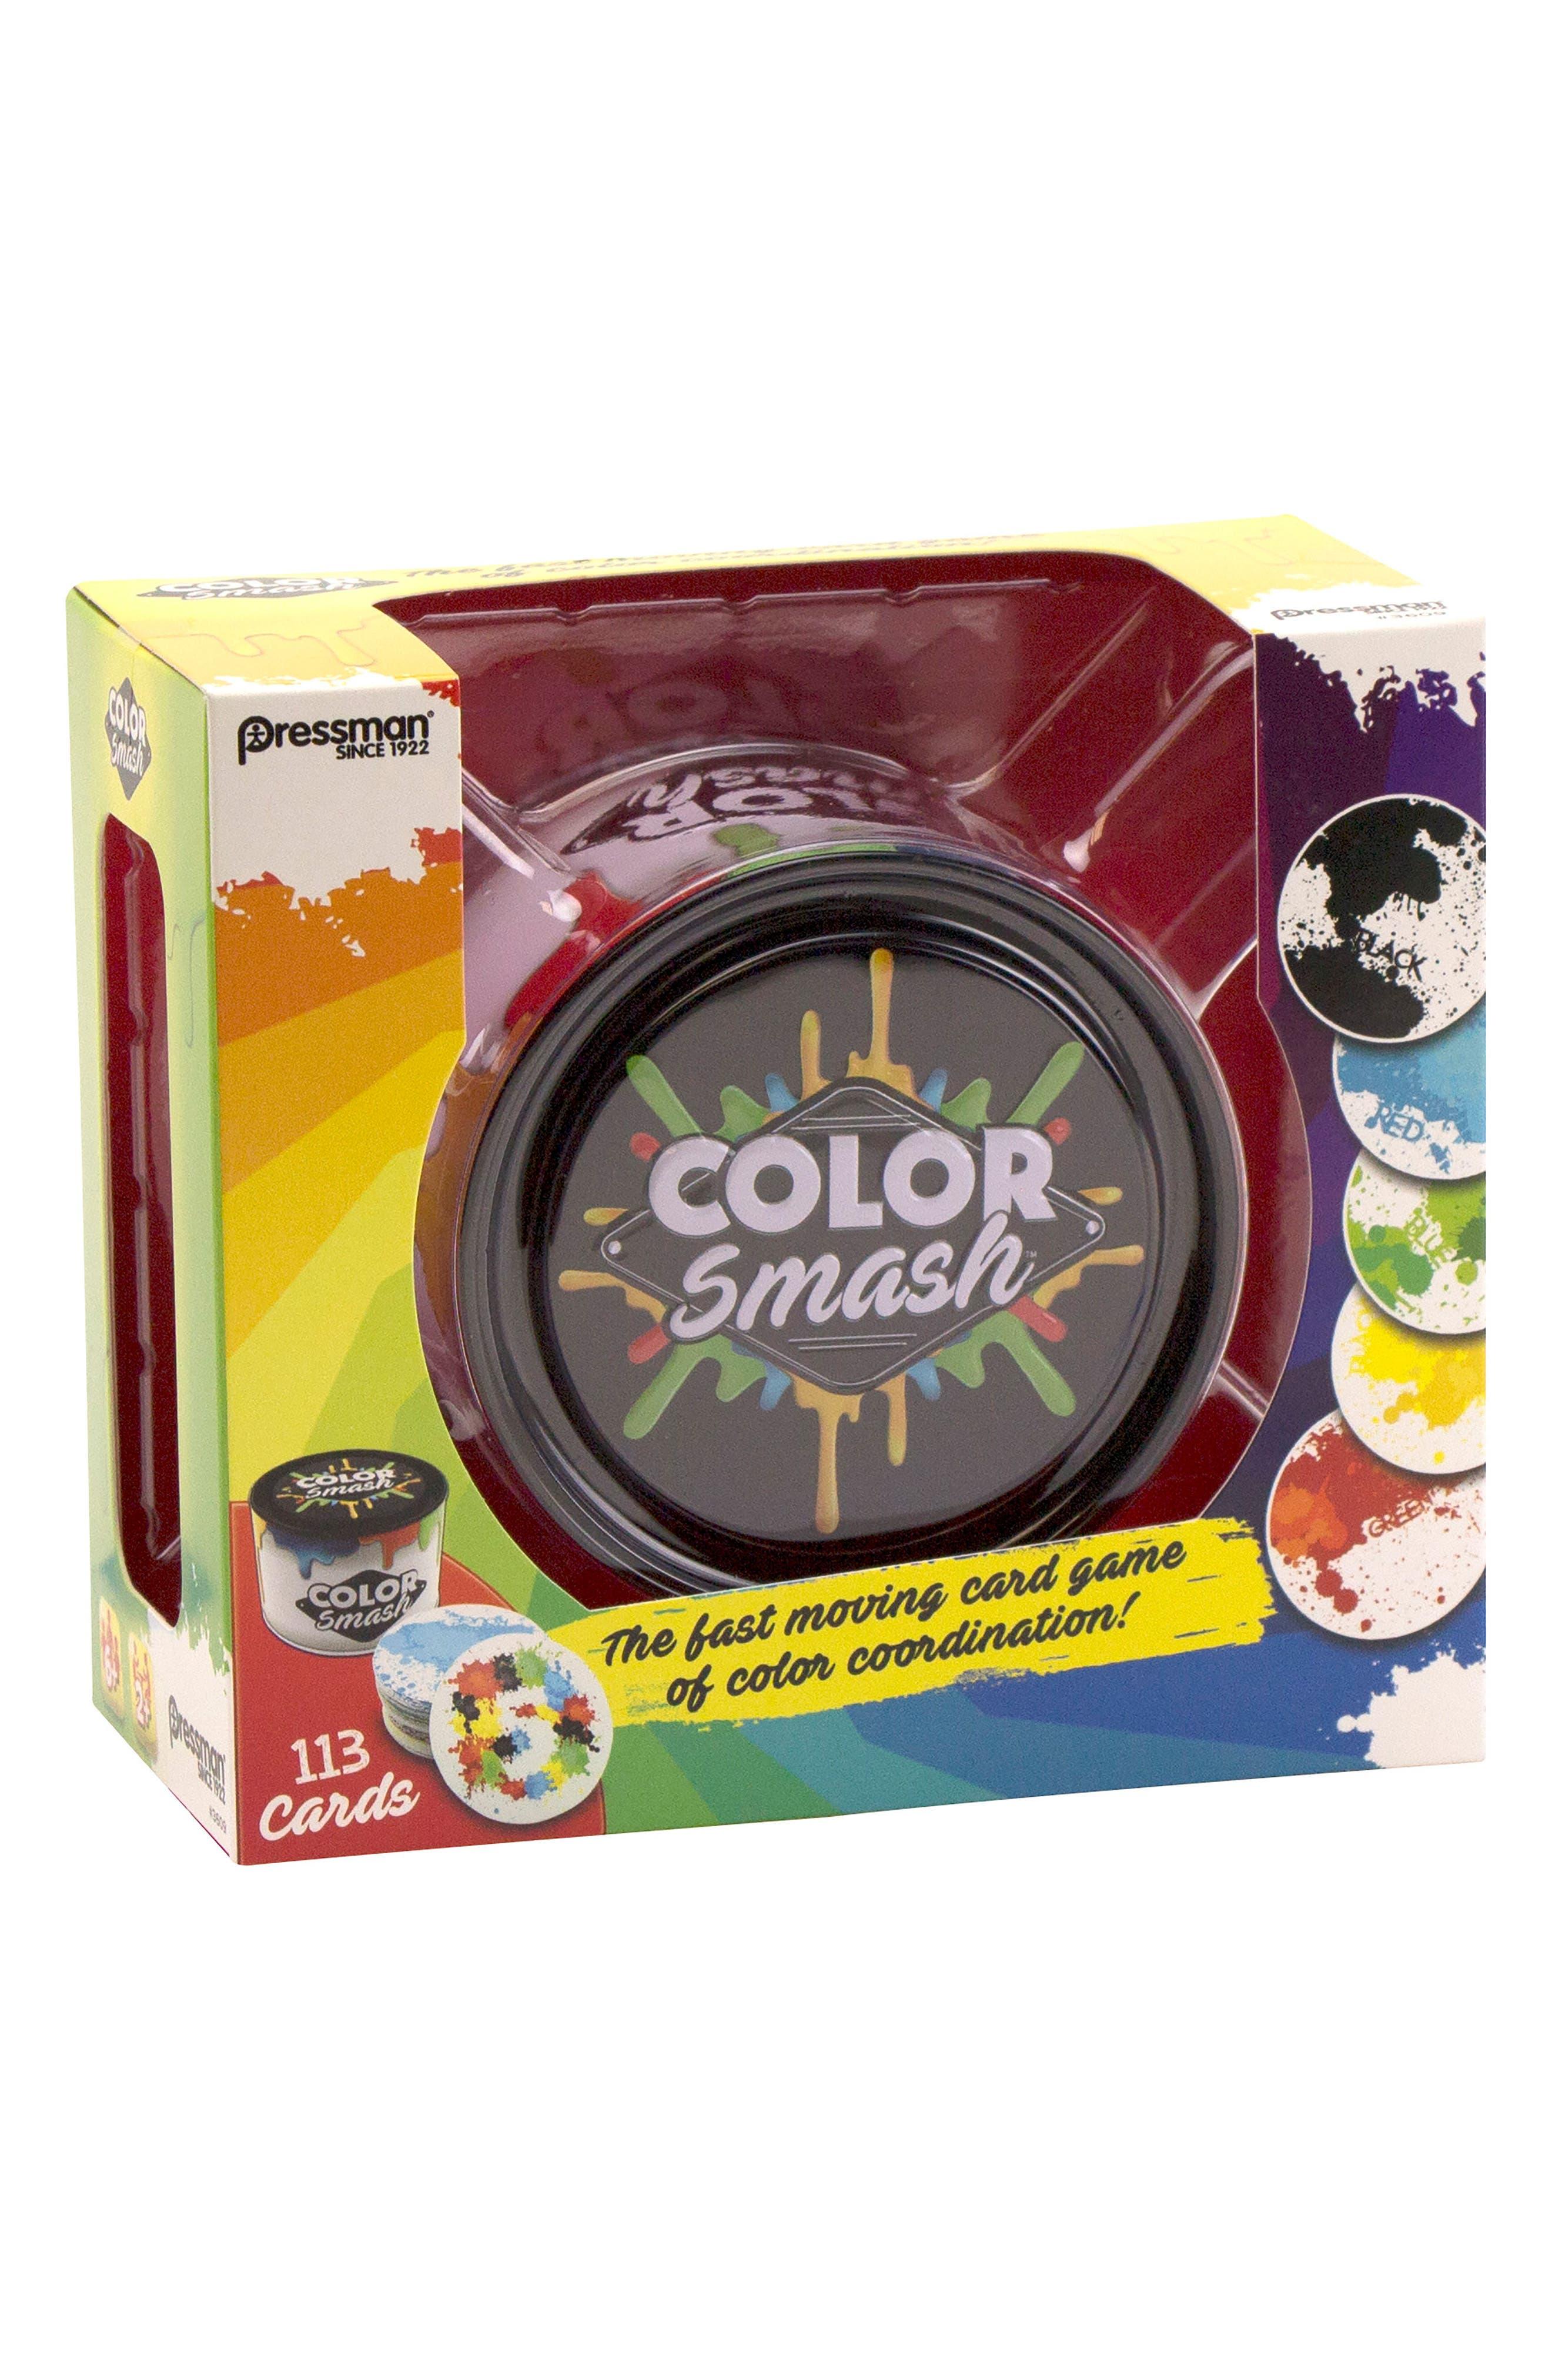 Main Image - Pressman Toy Color Smash Card Game